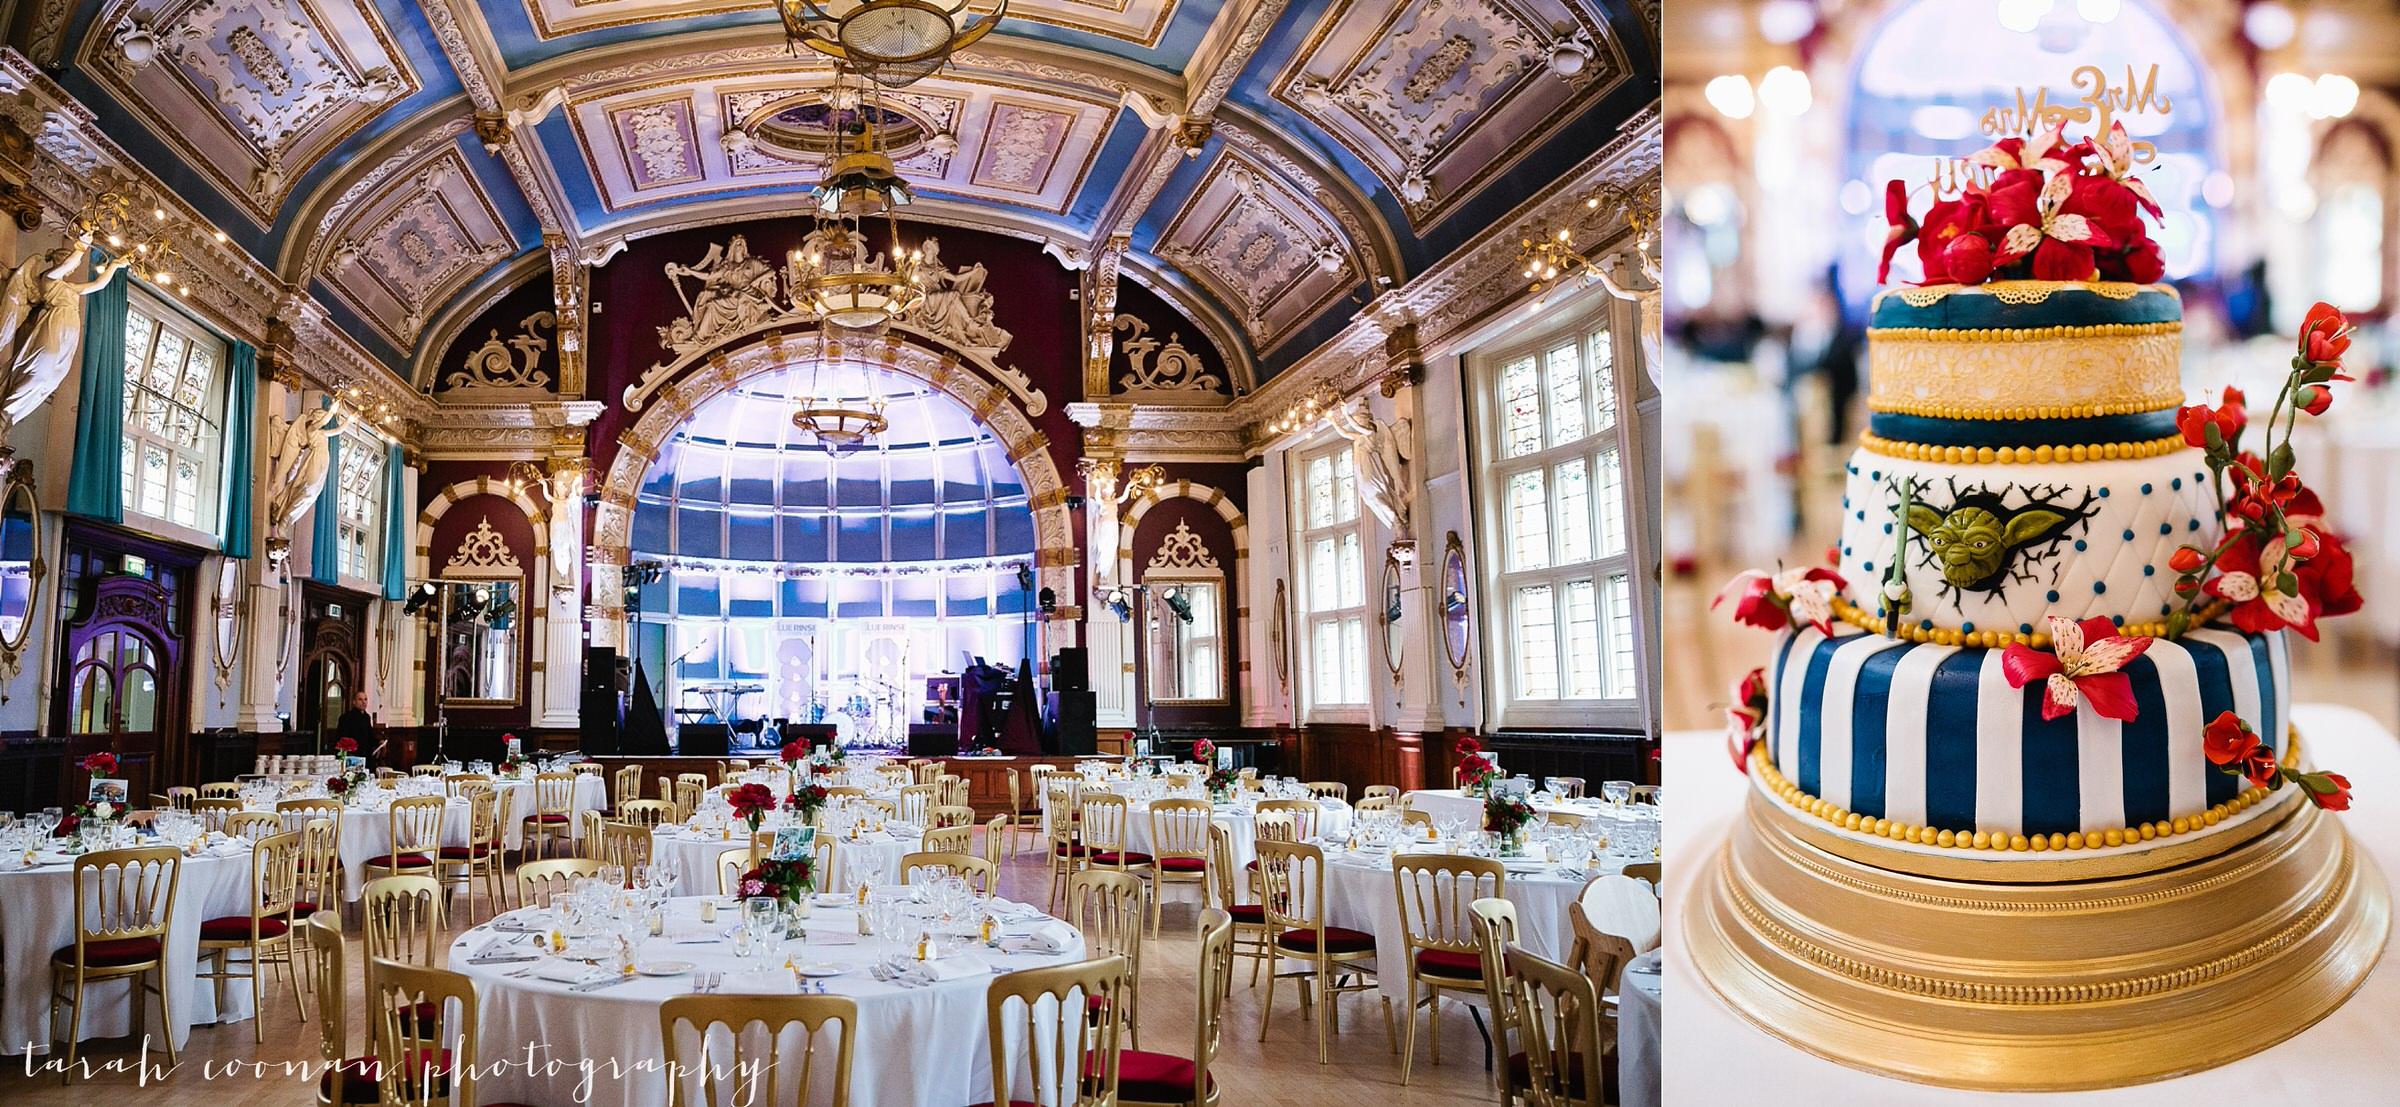 Old Finsbury Town Hall wedding